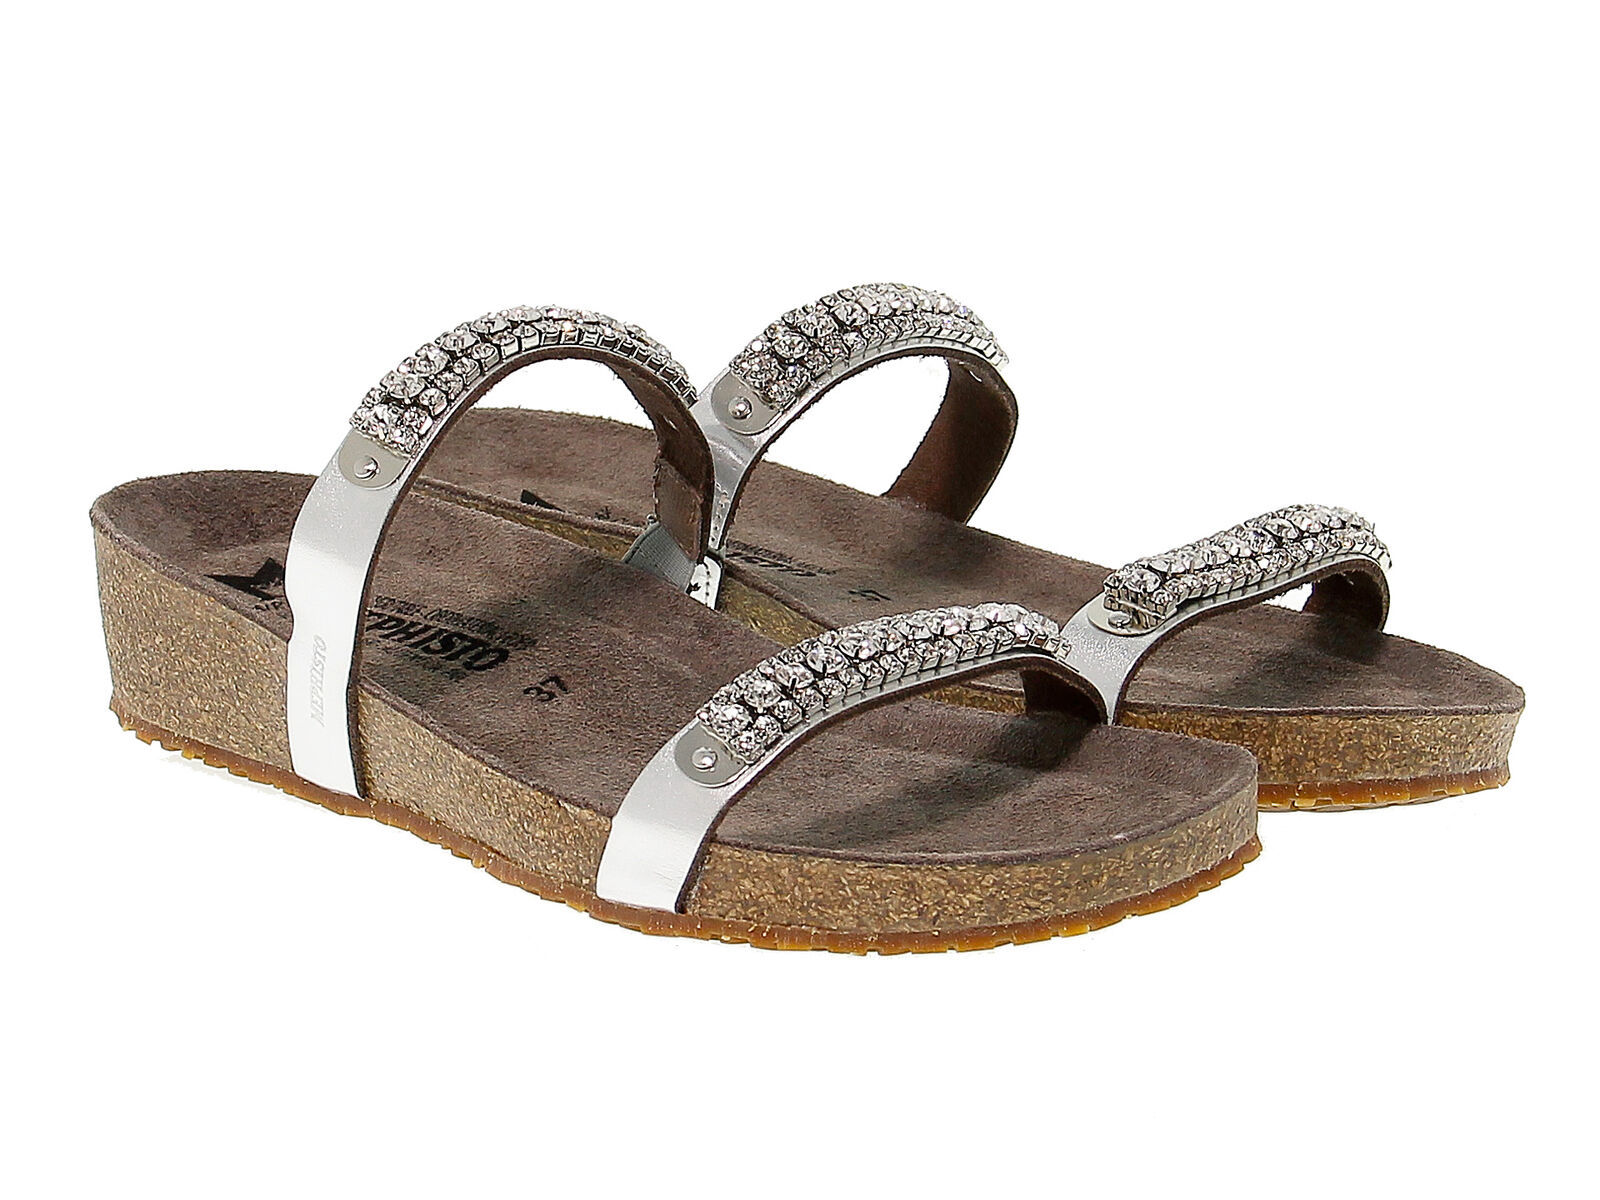 Sandalia plana MEPHISTO IVANA N de laminado nickel - Zapatos Mujer